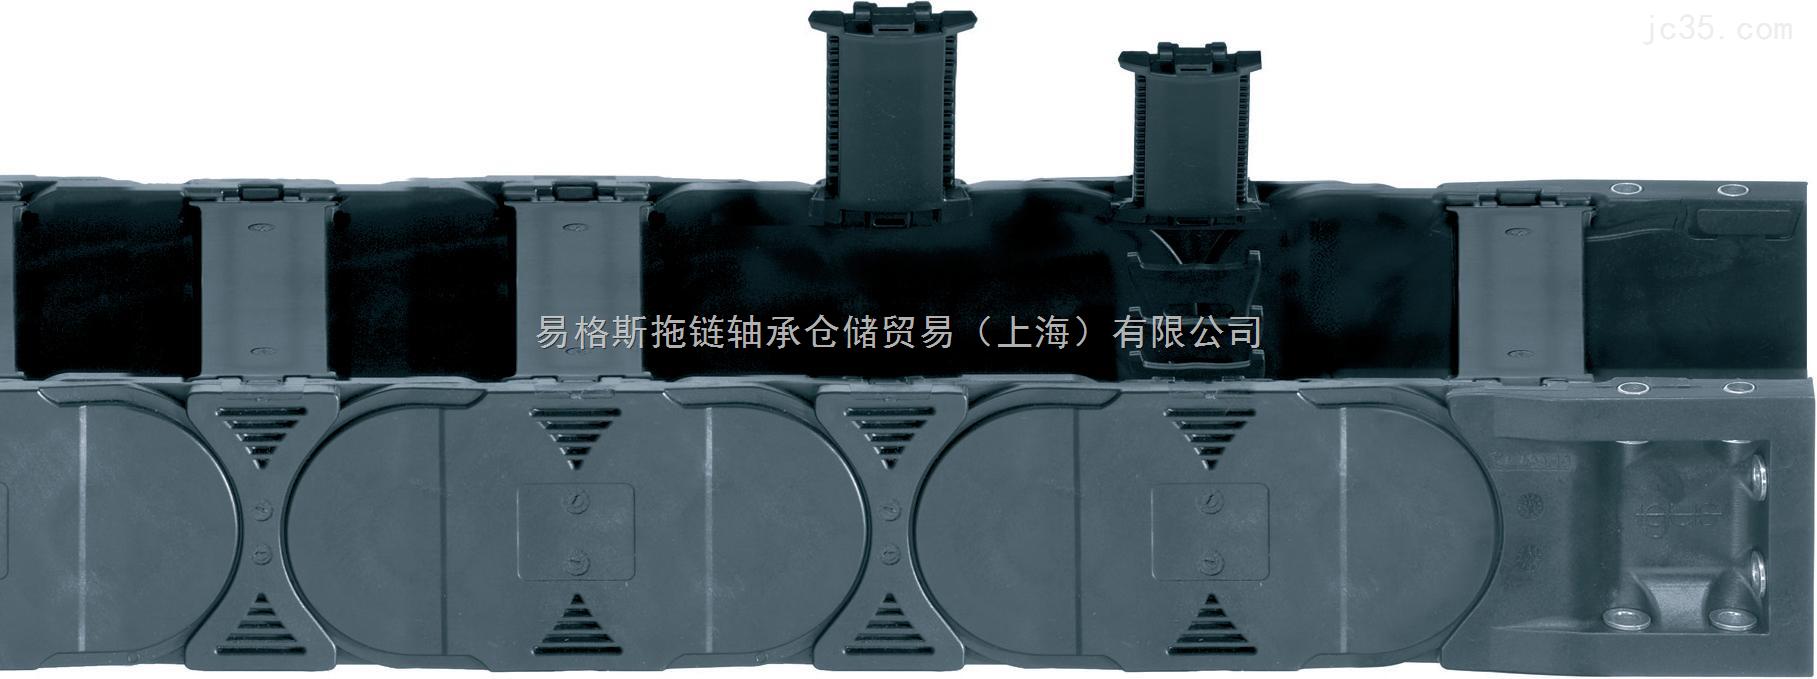 E4.1轻型拖链